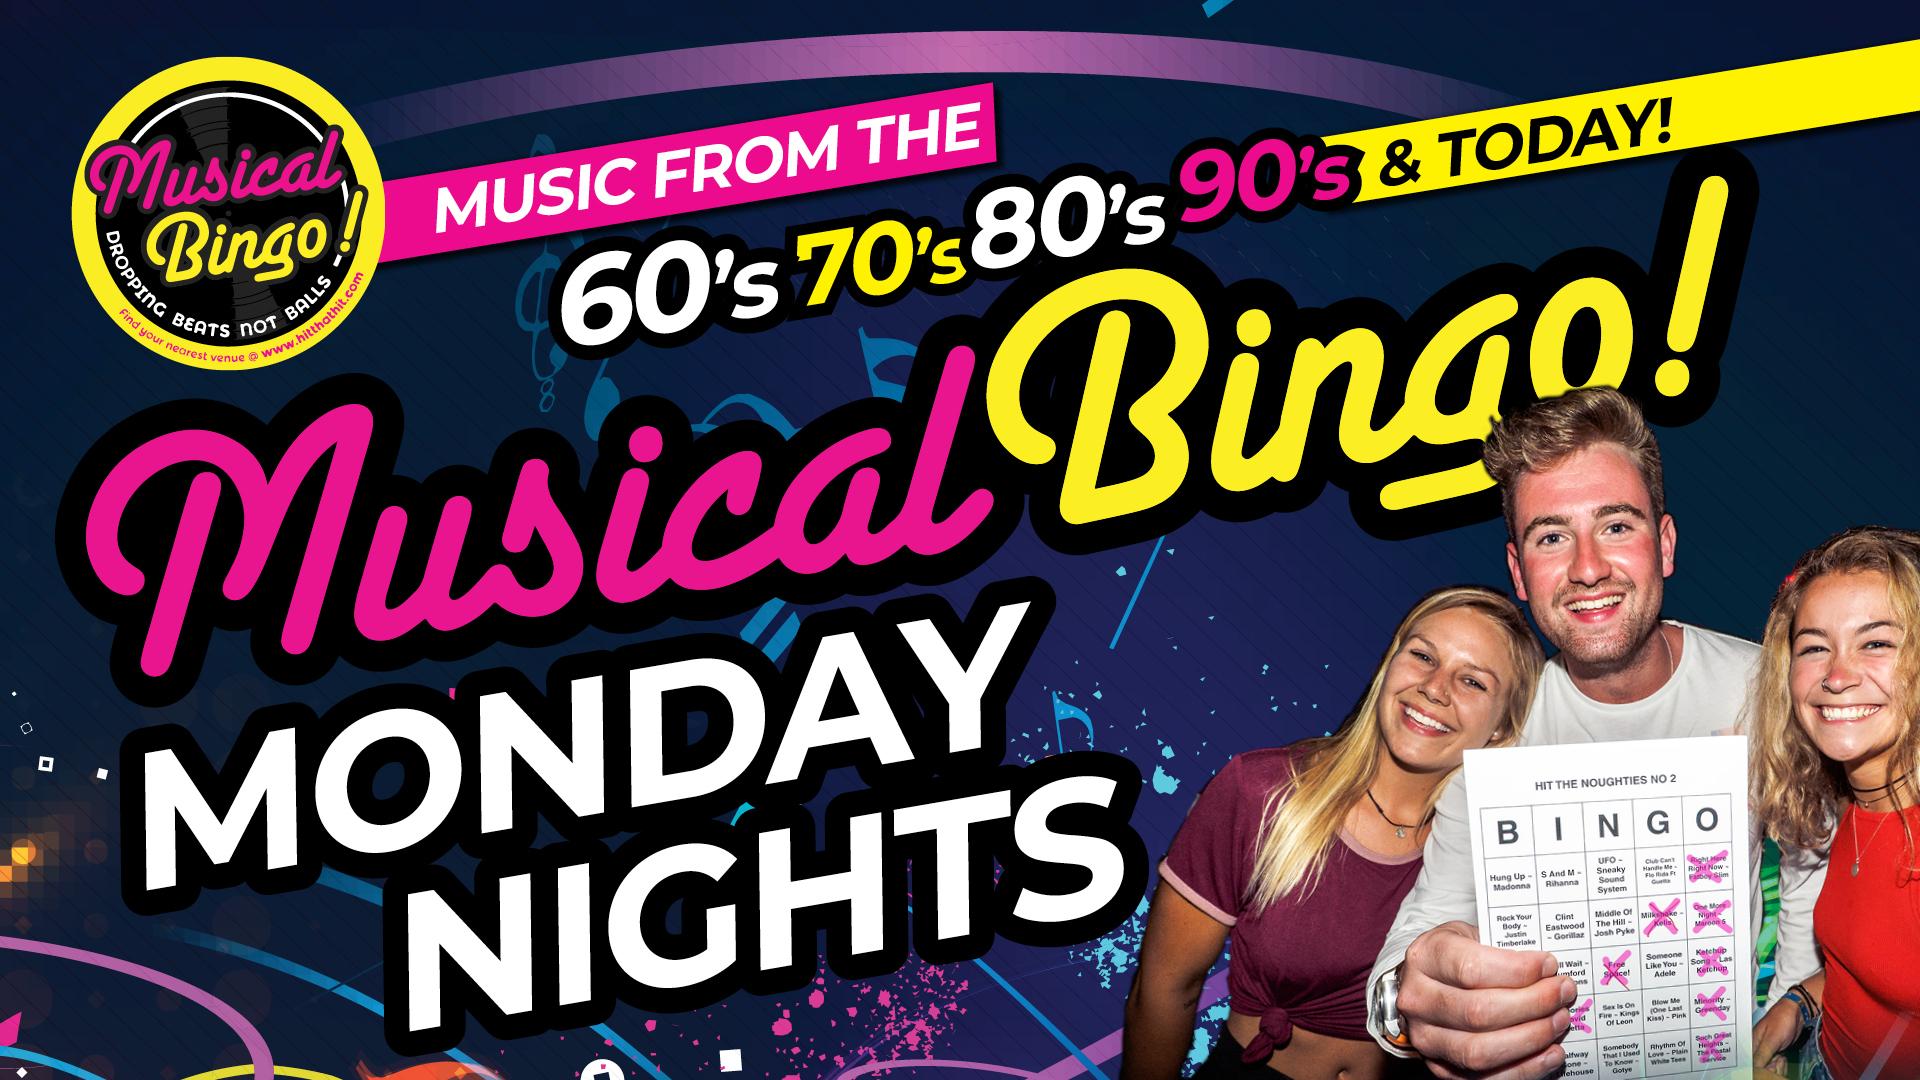 Musical Bingo Nightlife Graphic - Monday.jpg